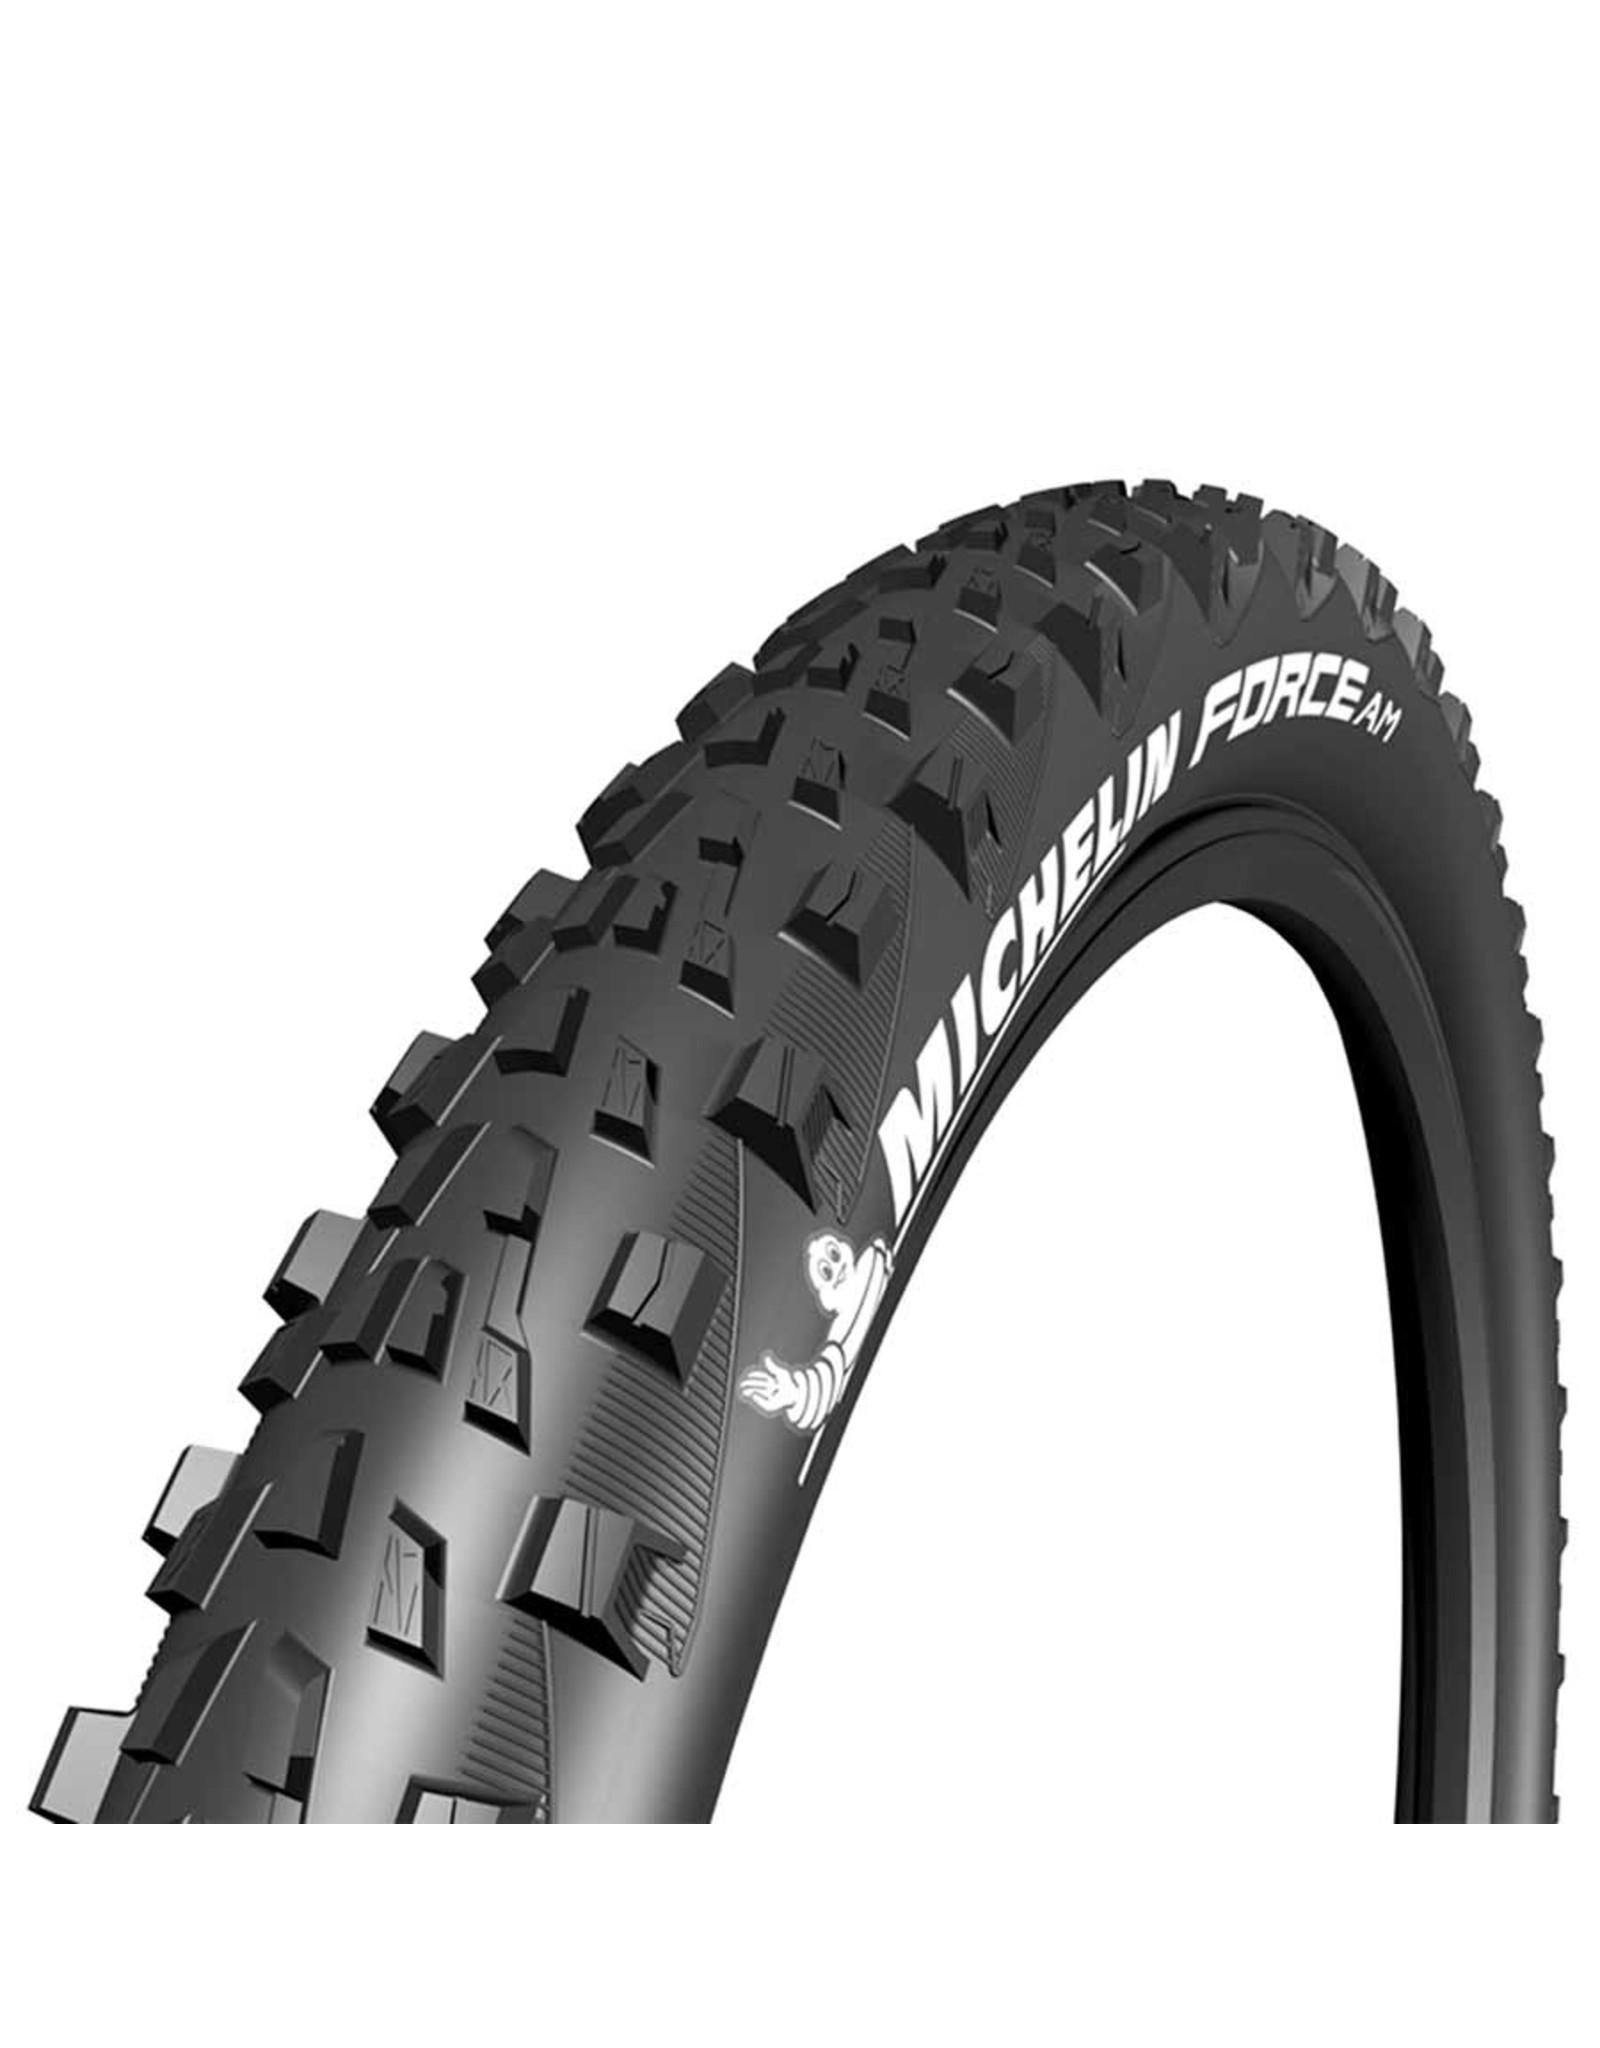 Michelin Michelin, Force AM Comp, Tire, 27.5''x2.60, Folding, Tubeless Ready, GUM-X, 60TPI, Black